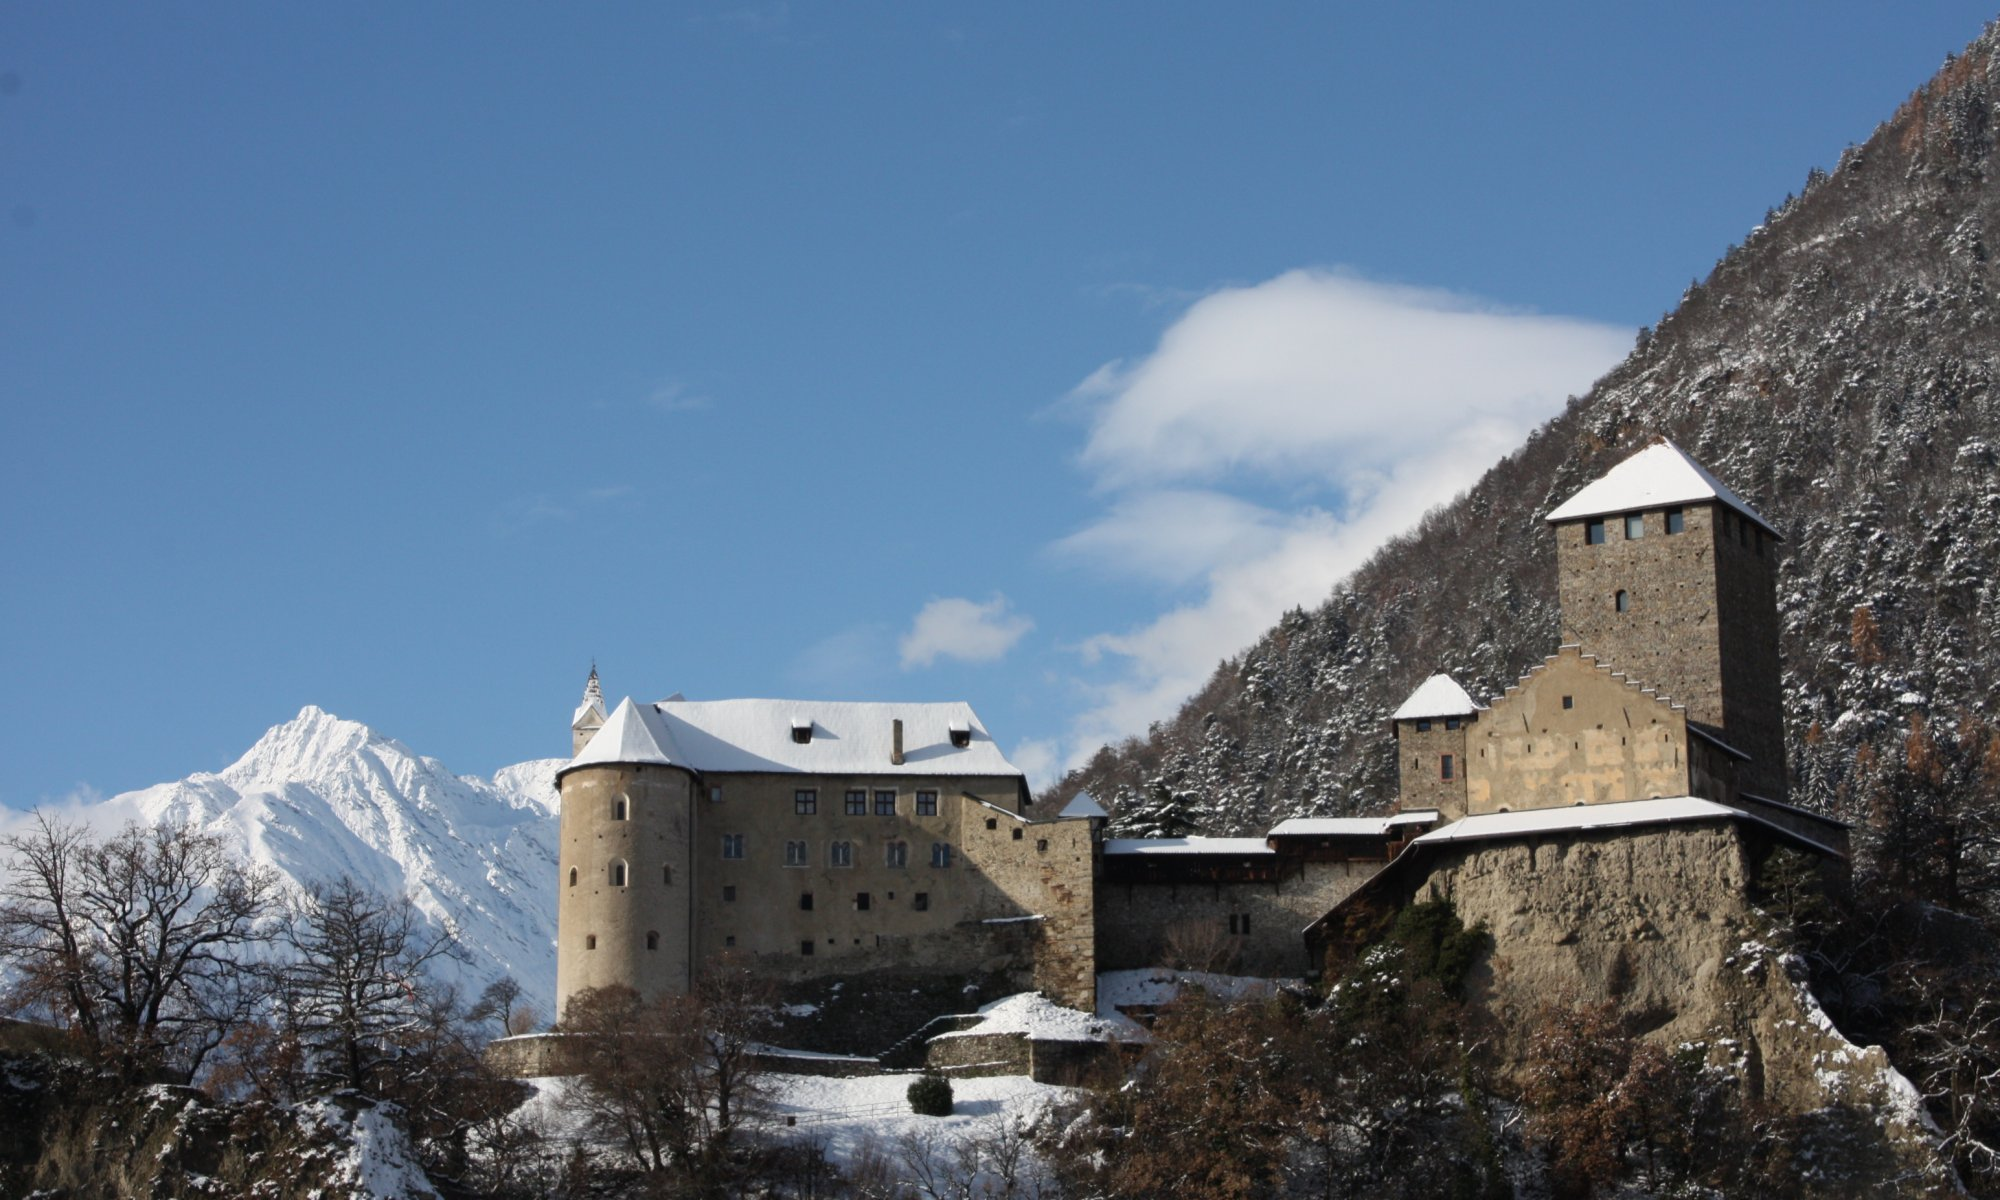 Schloß Tirol, Merano